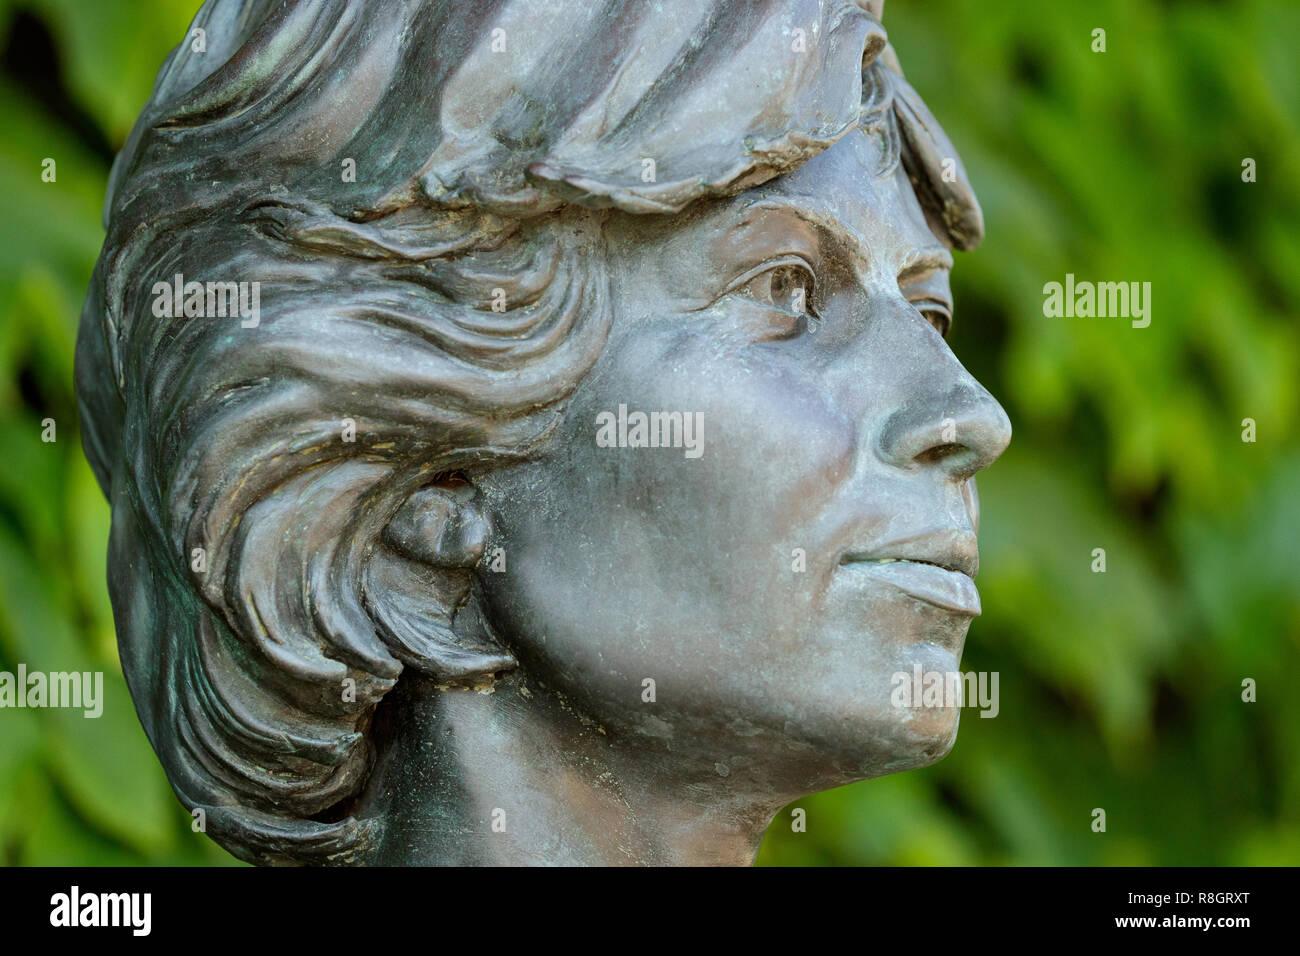 Statue of British tennis legends Virginia Wade - Stock Image